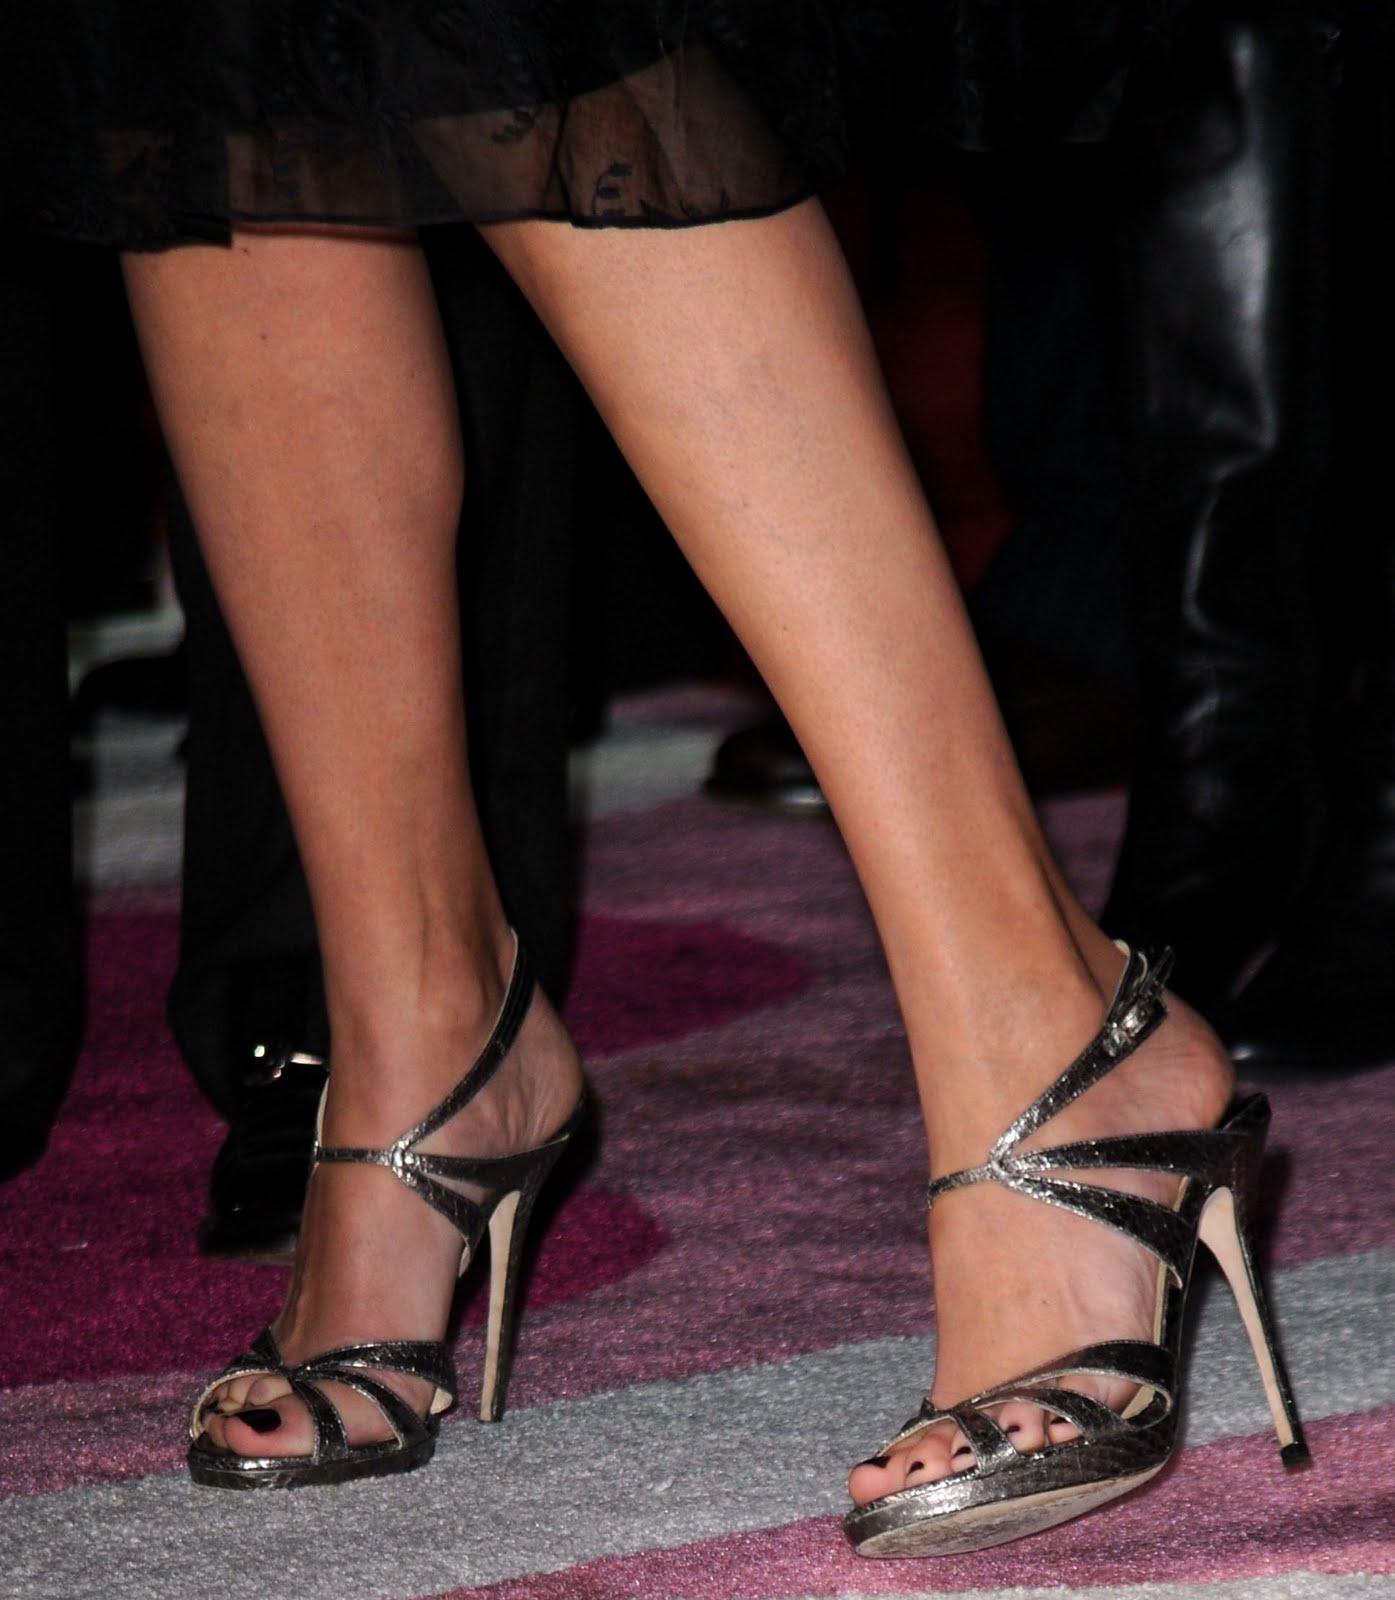 http://1.bp.blogspot.com/_UaLWp72nij4/S-Mk1FQDFwI/AAAAAAAAJ8o/Hgt6WzYlZwA/s1600/julia-roberts-feet-5.jpg